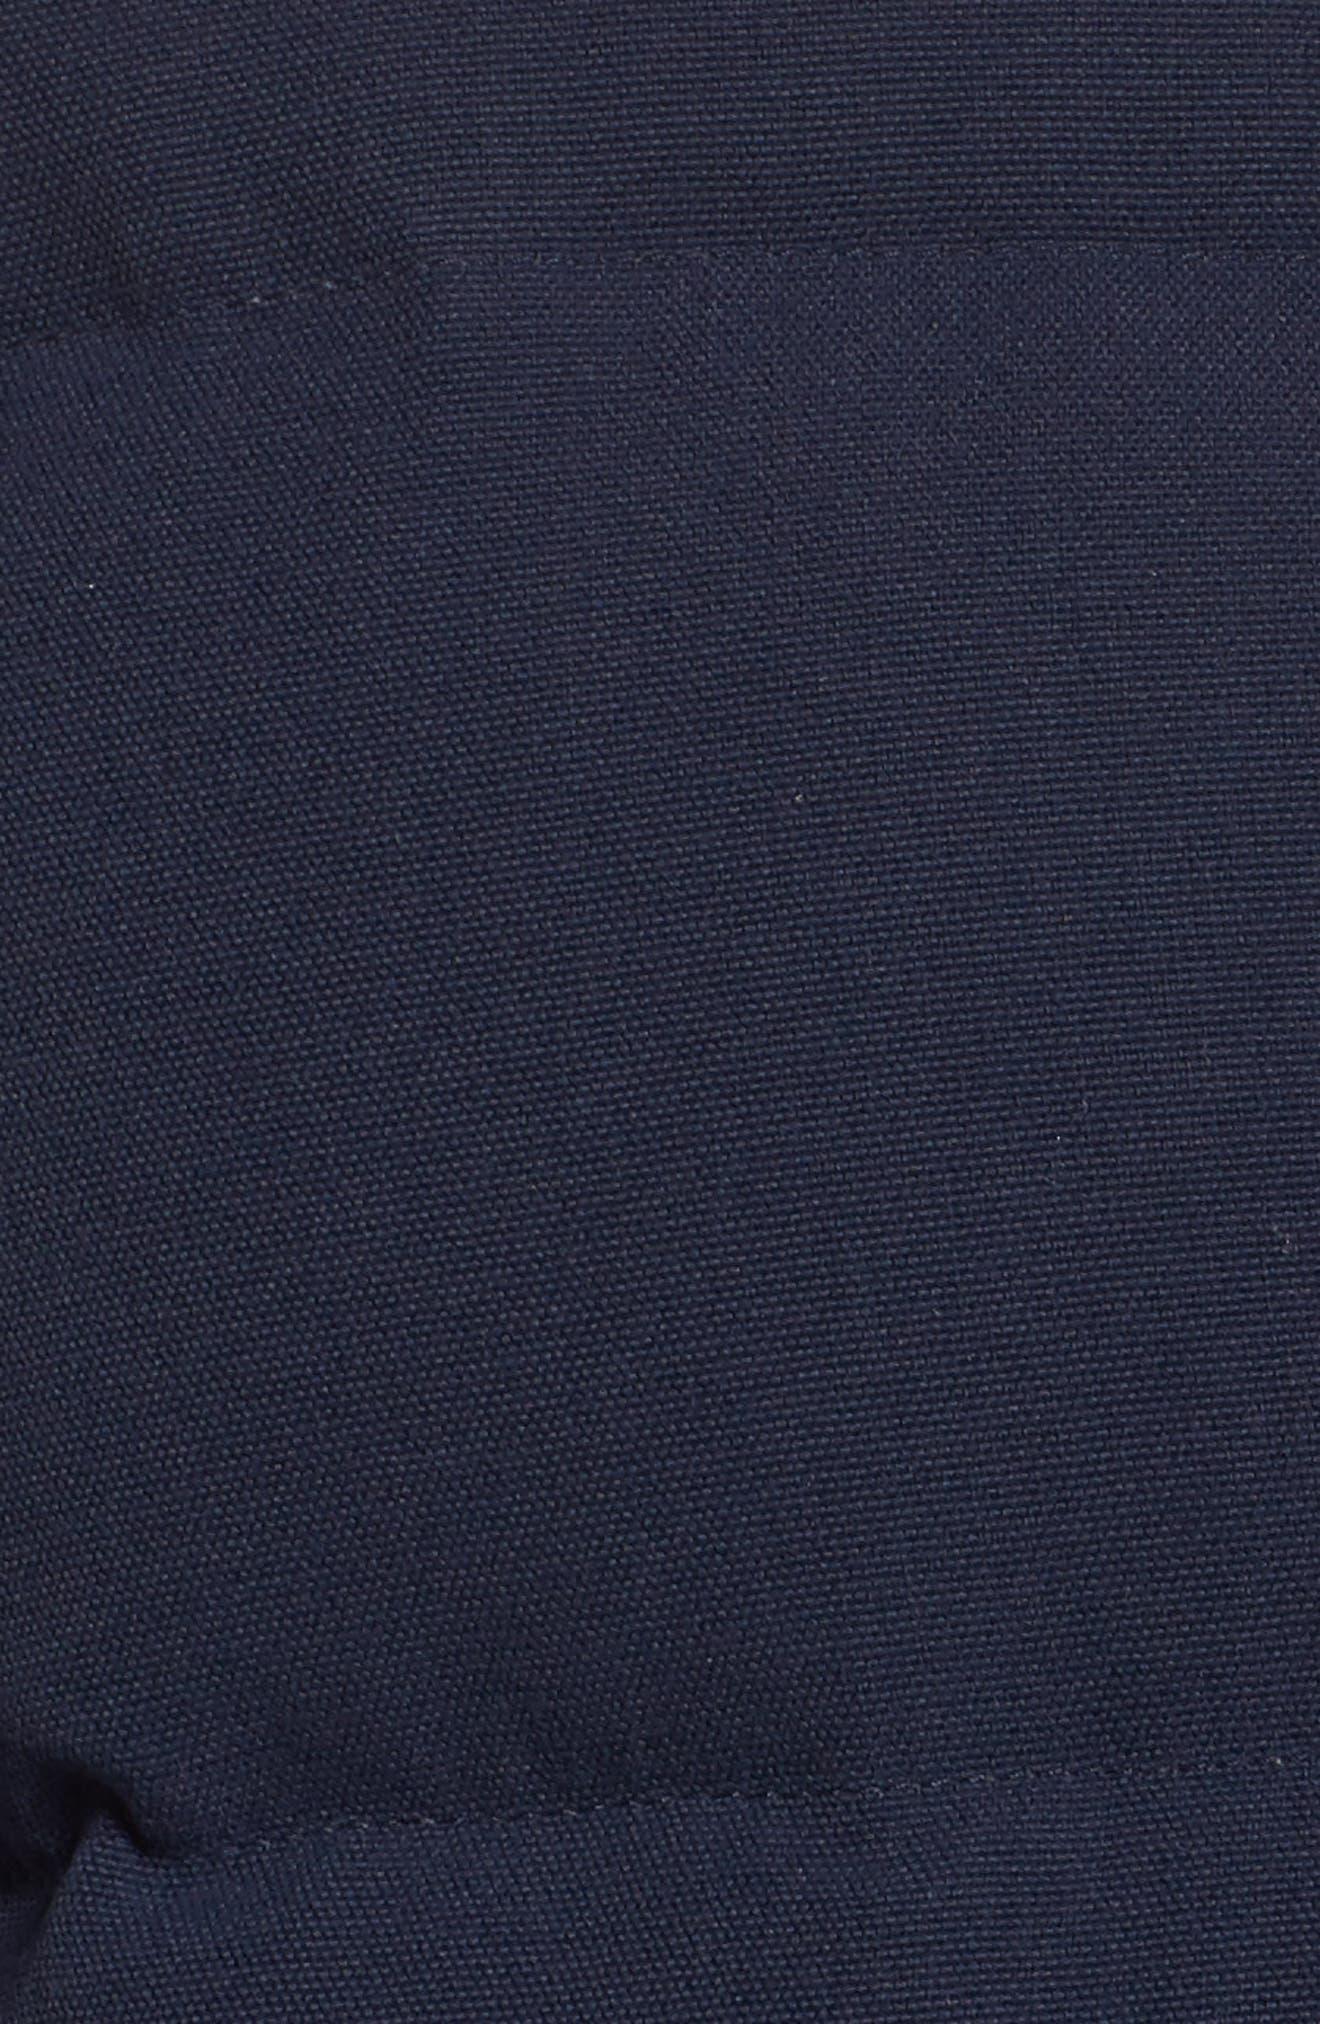 'Bivy' Water Repellent Down Jacket,                             Alternate thumbnail 23, color,